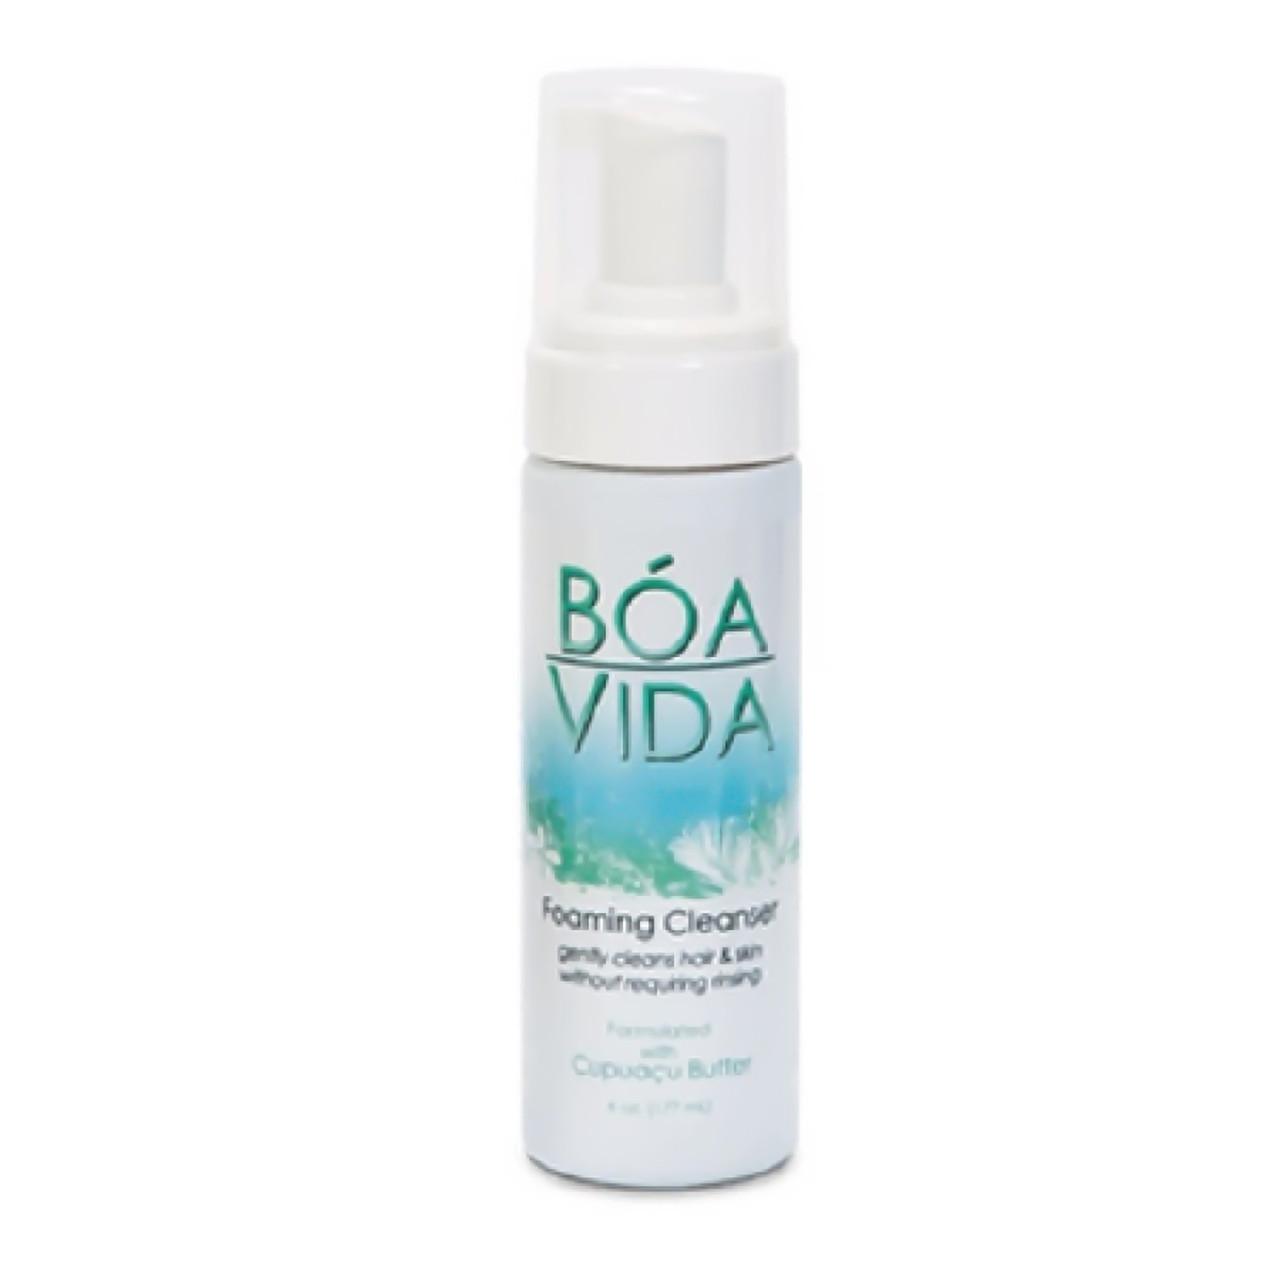 Boavida Shampoo And Body Wash Citrus Vanilla Scent 6 Oz Simply Medical